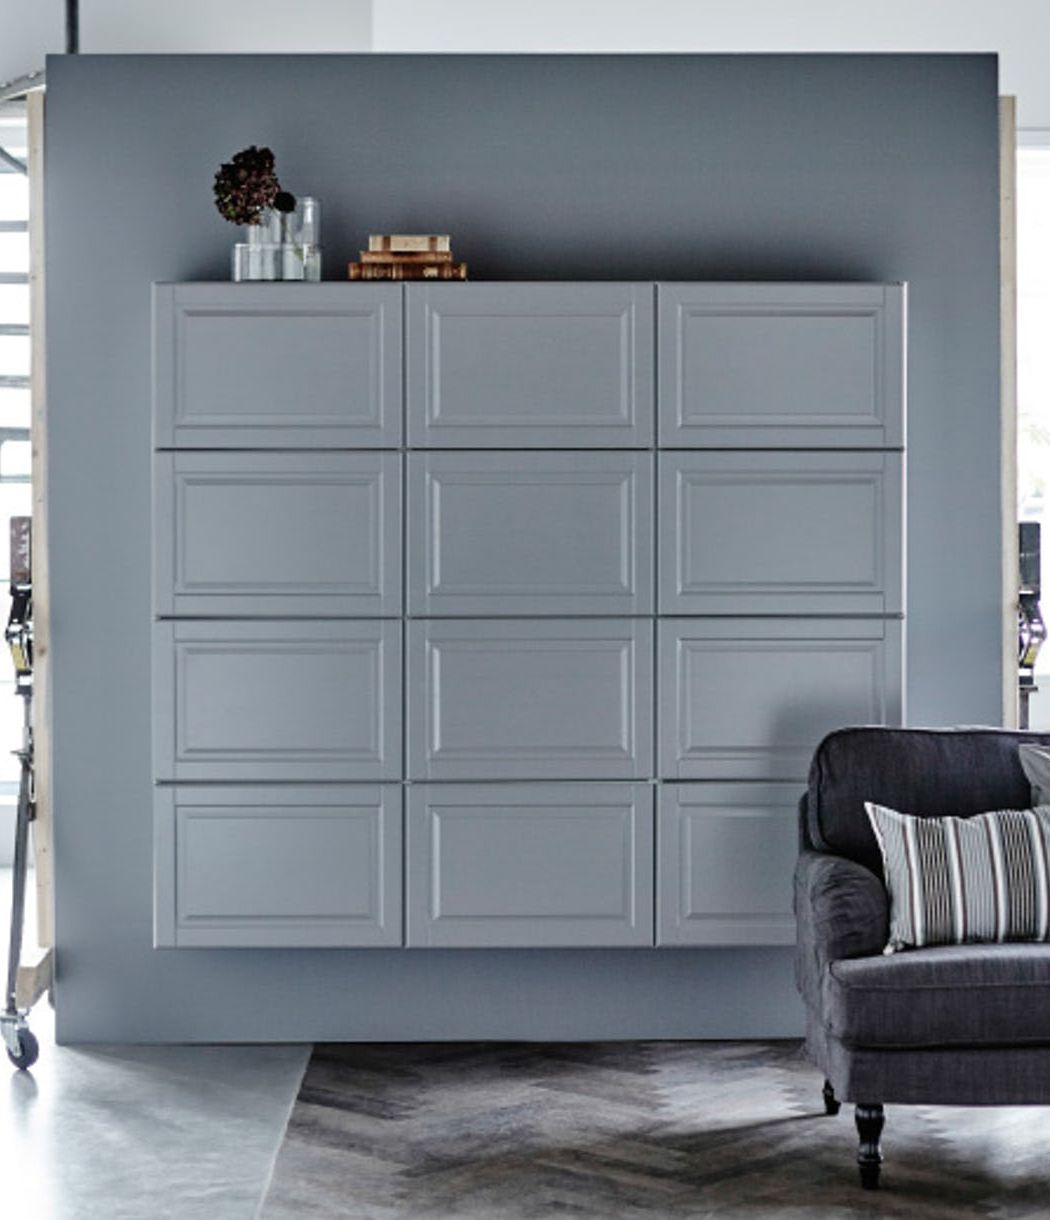 7 big ikea home hacks that make huge wall statements on wall cabinets id=60451